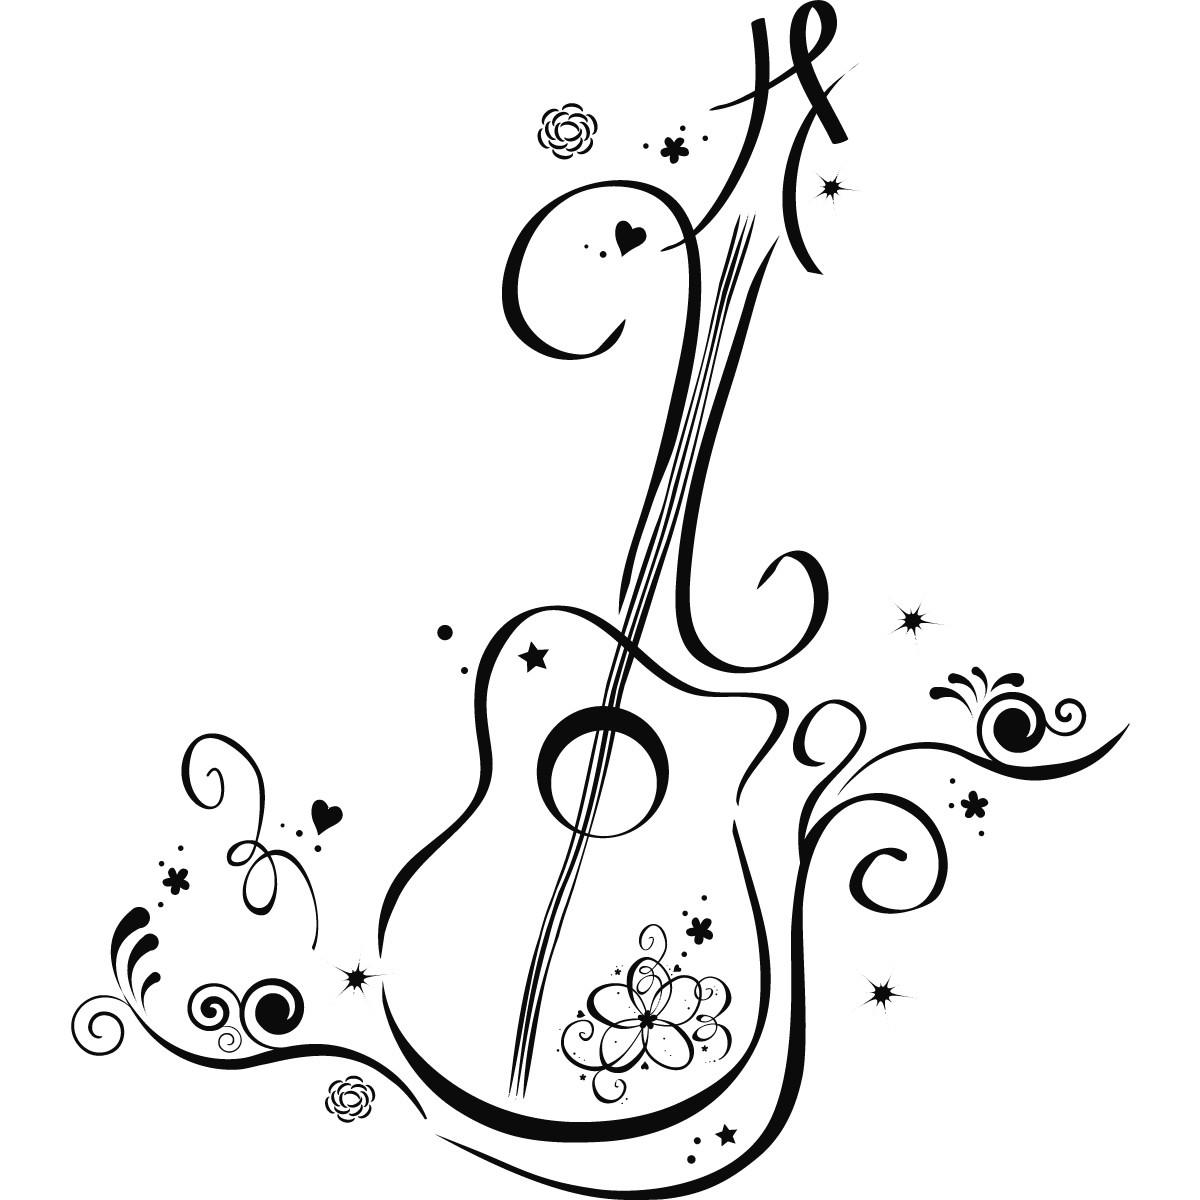 Guitar Wallpaper Collection: Desktop Guitar Wallpaper